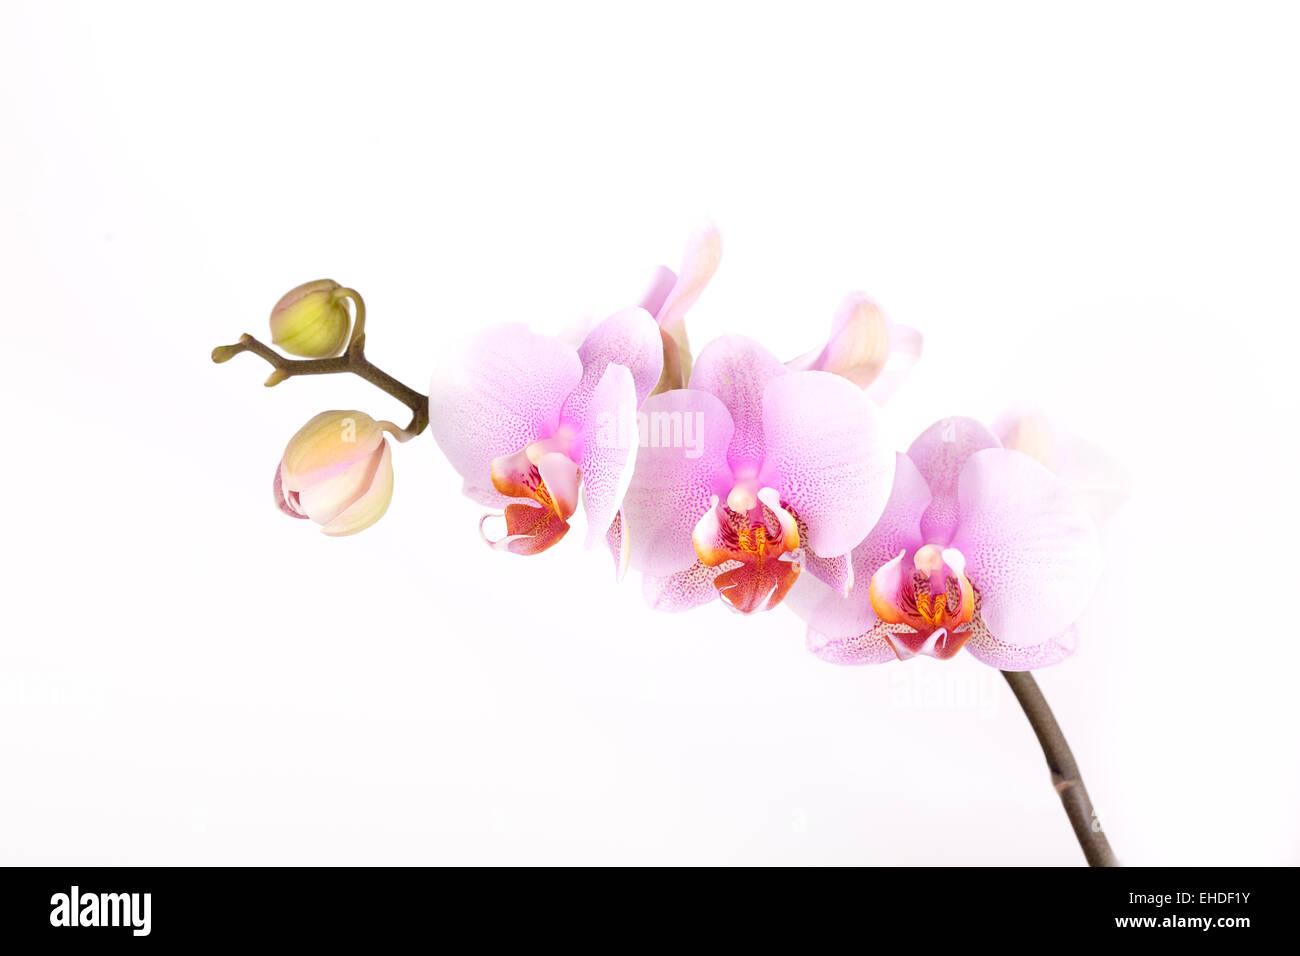 Rosa Orchidee - Stock Image